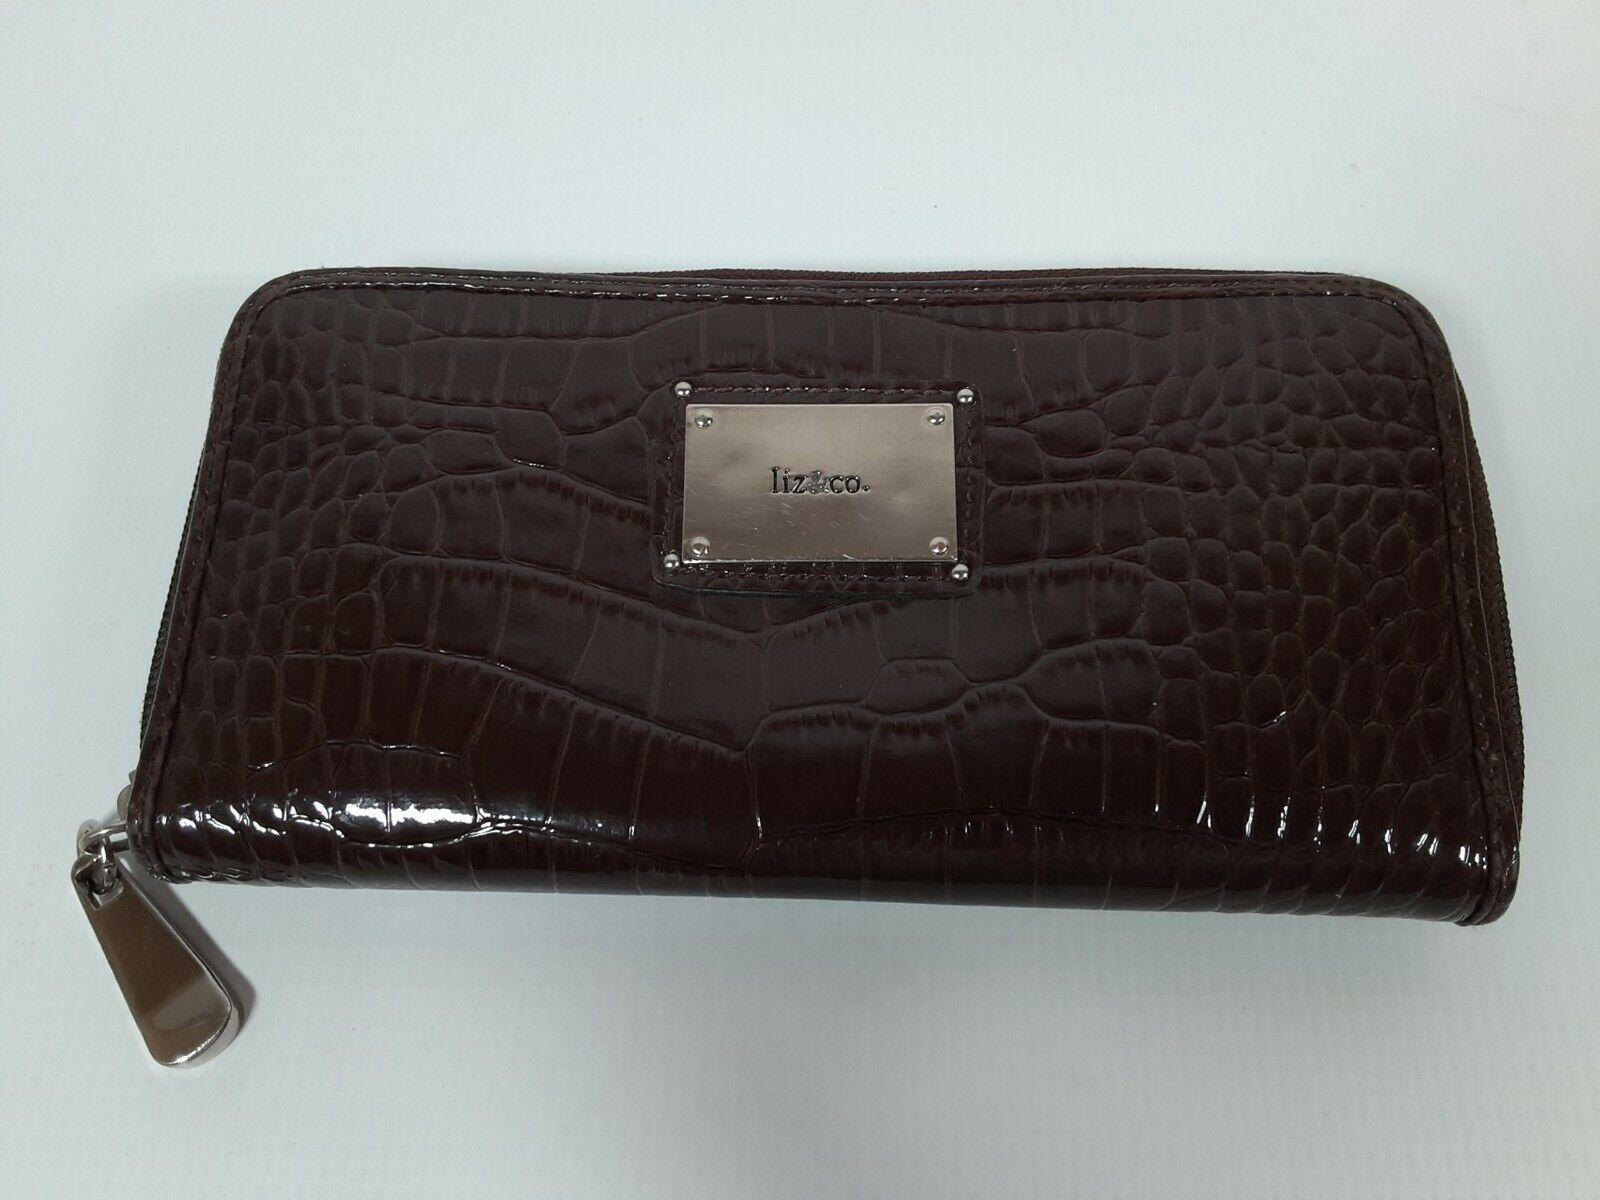 Liz & Co Brown PVC Zippered Wallet, Card Holder, Coin Purse, Checkbook Holder